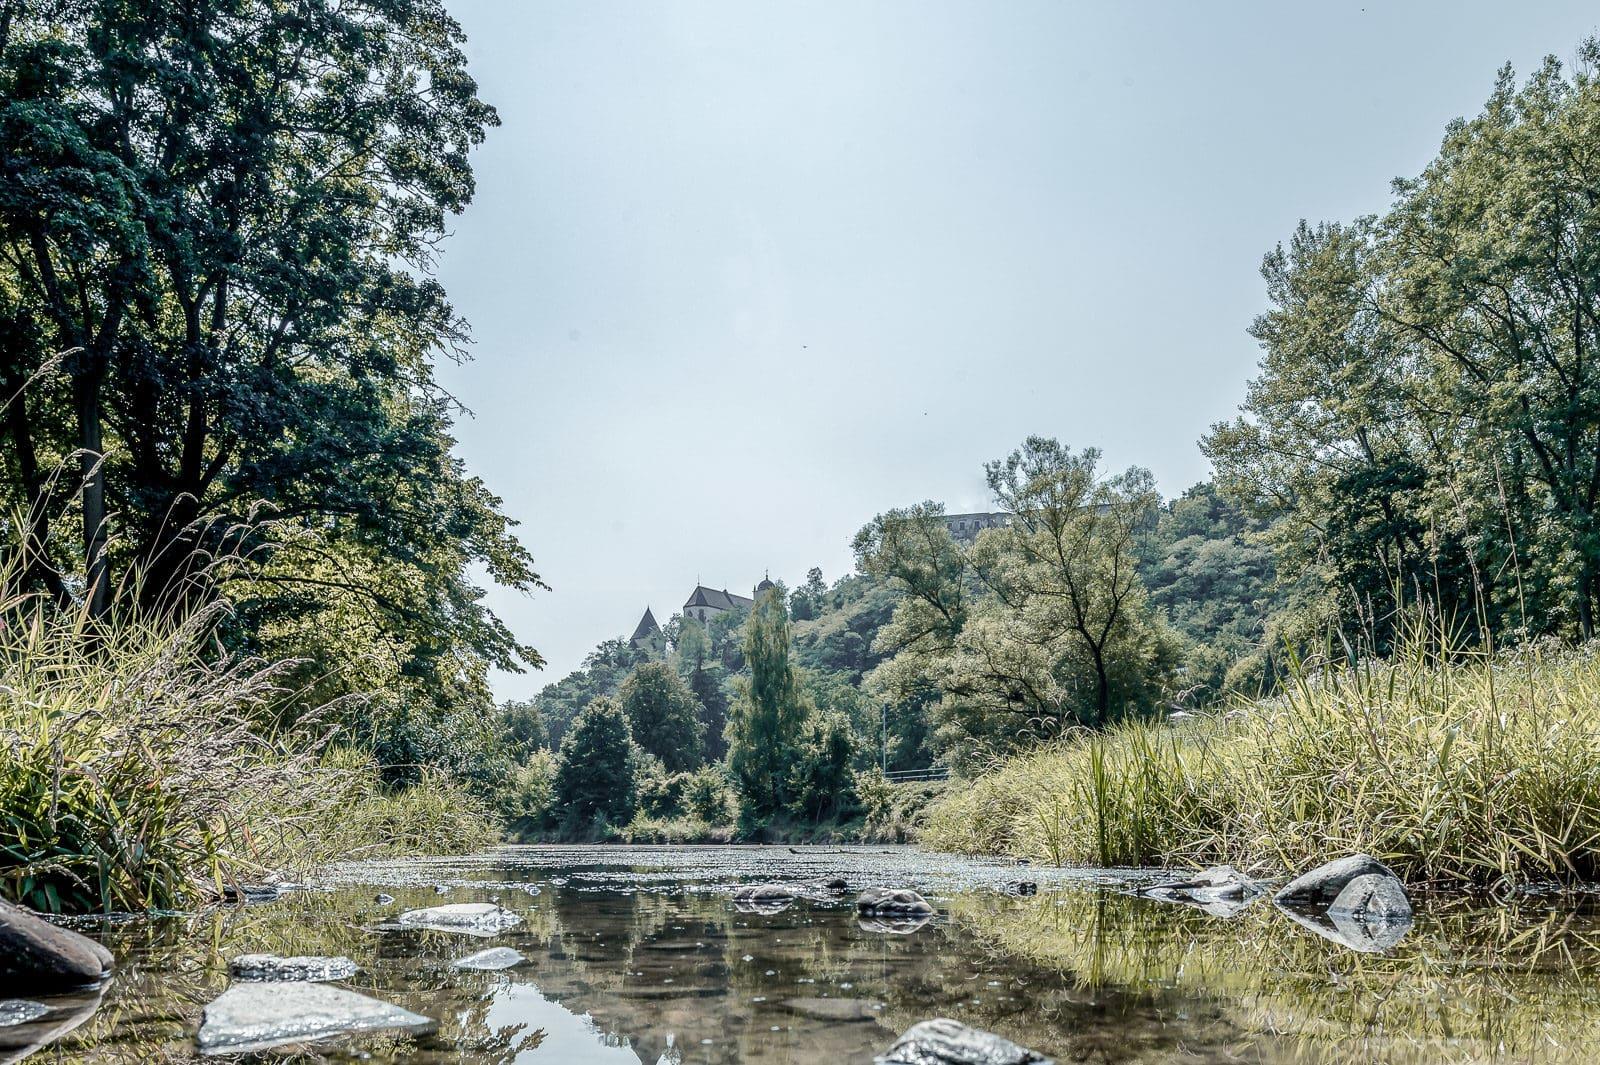 Bild vom Fluss Kamp